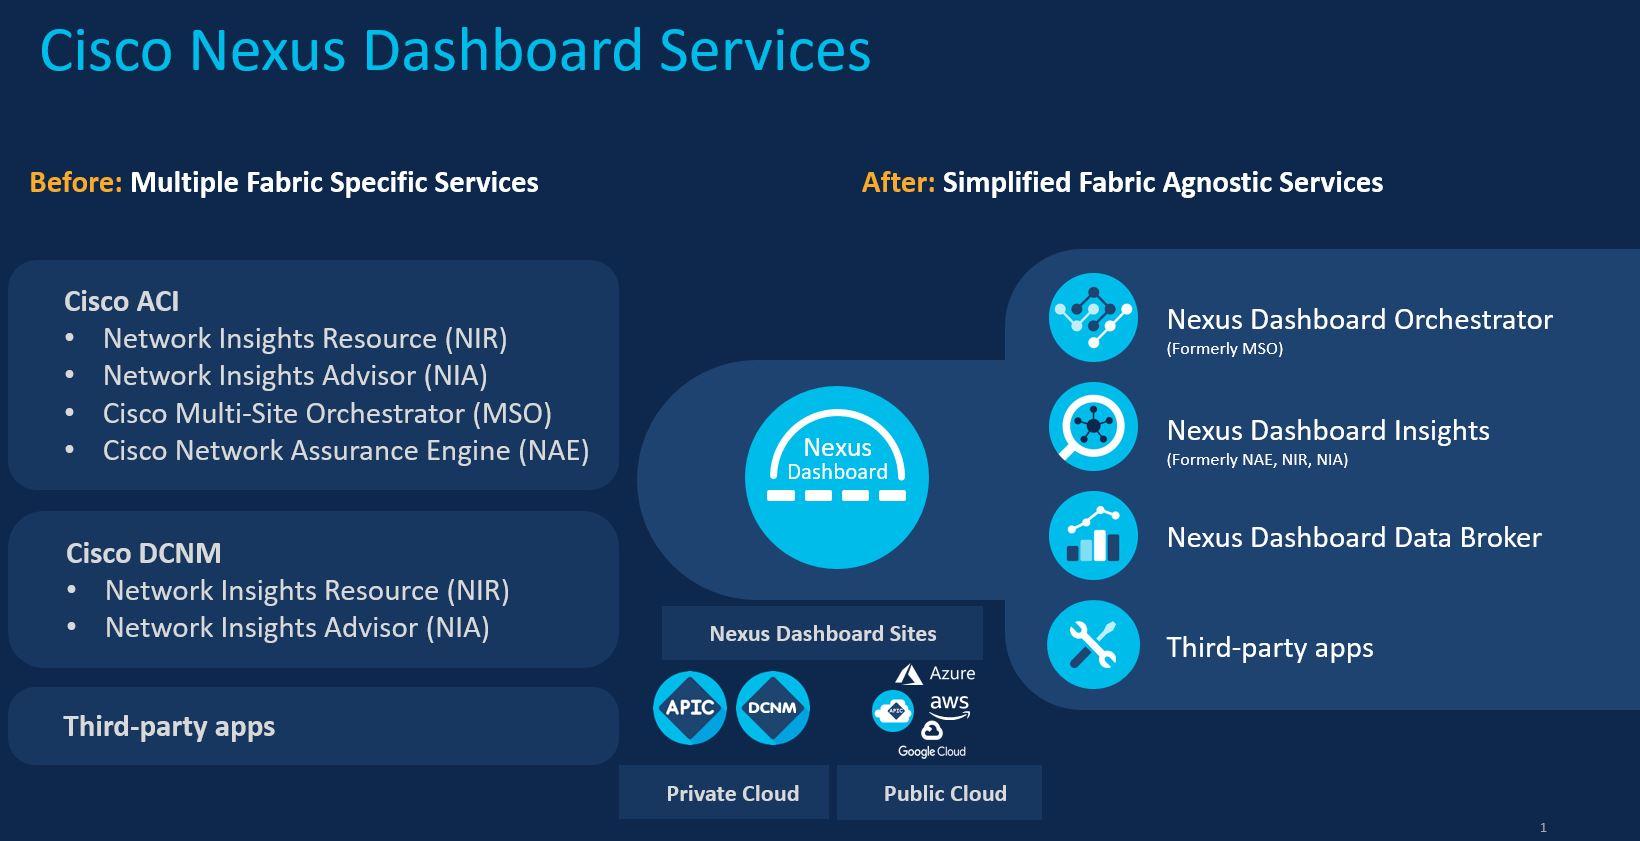 Cisco Nexus Dashboard Centralized Services